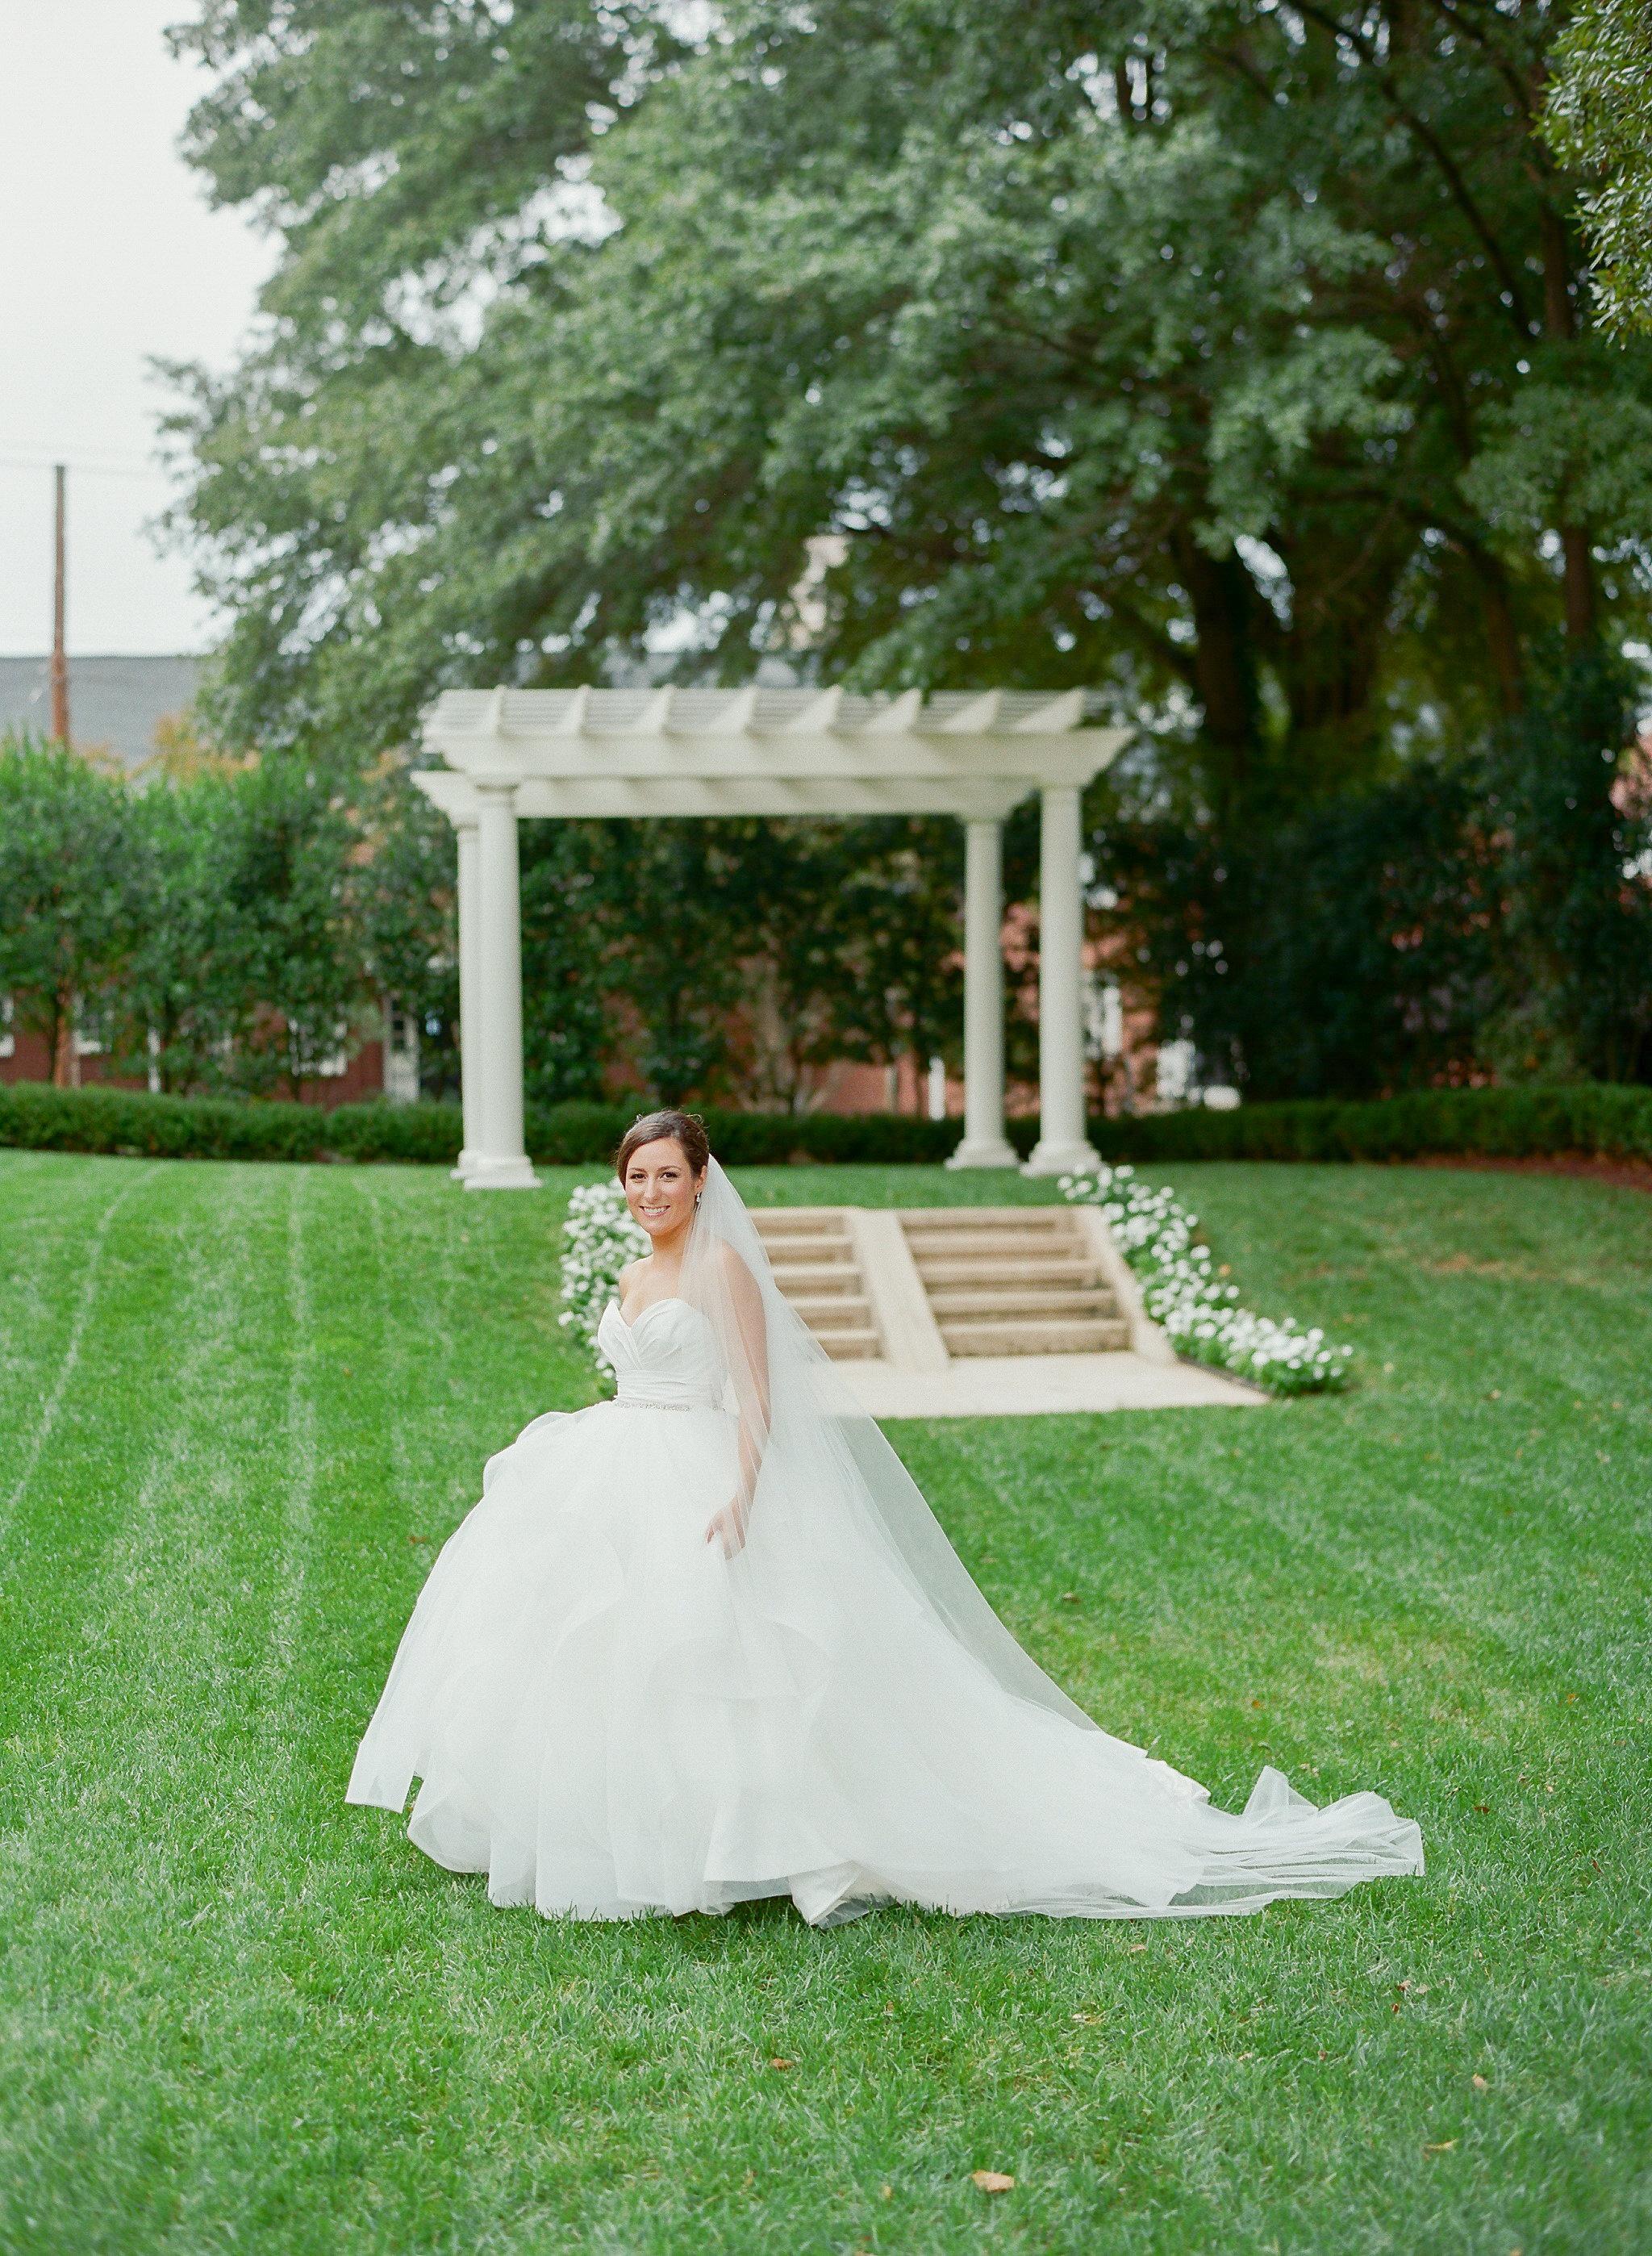 North-Carolina-Bridal-Photographer-Rebecca-5.jpg